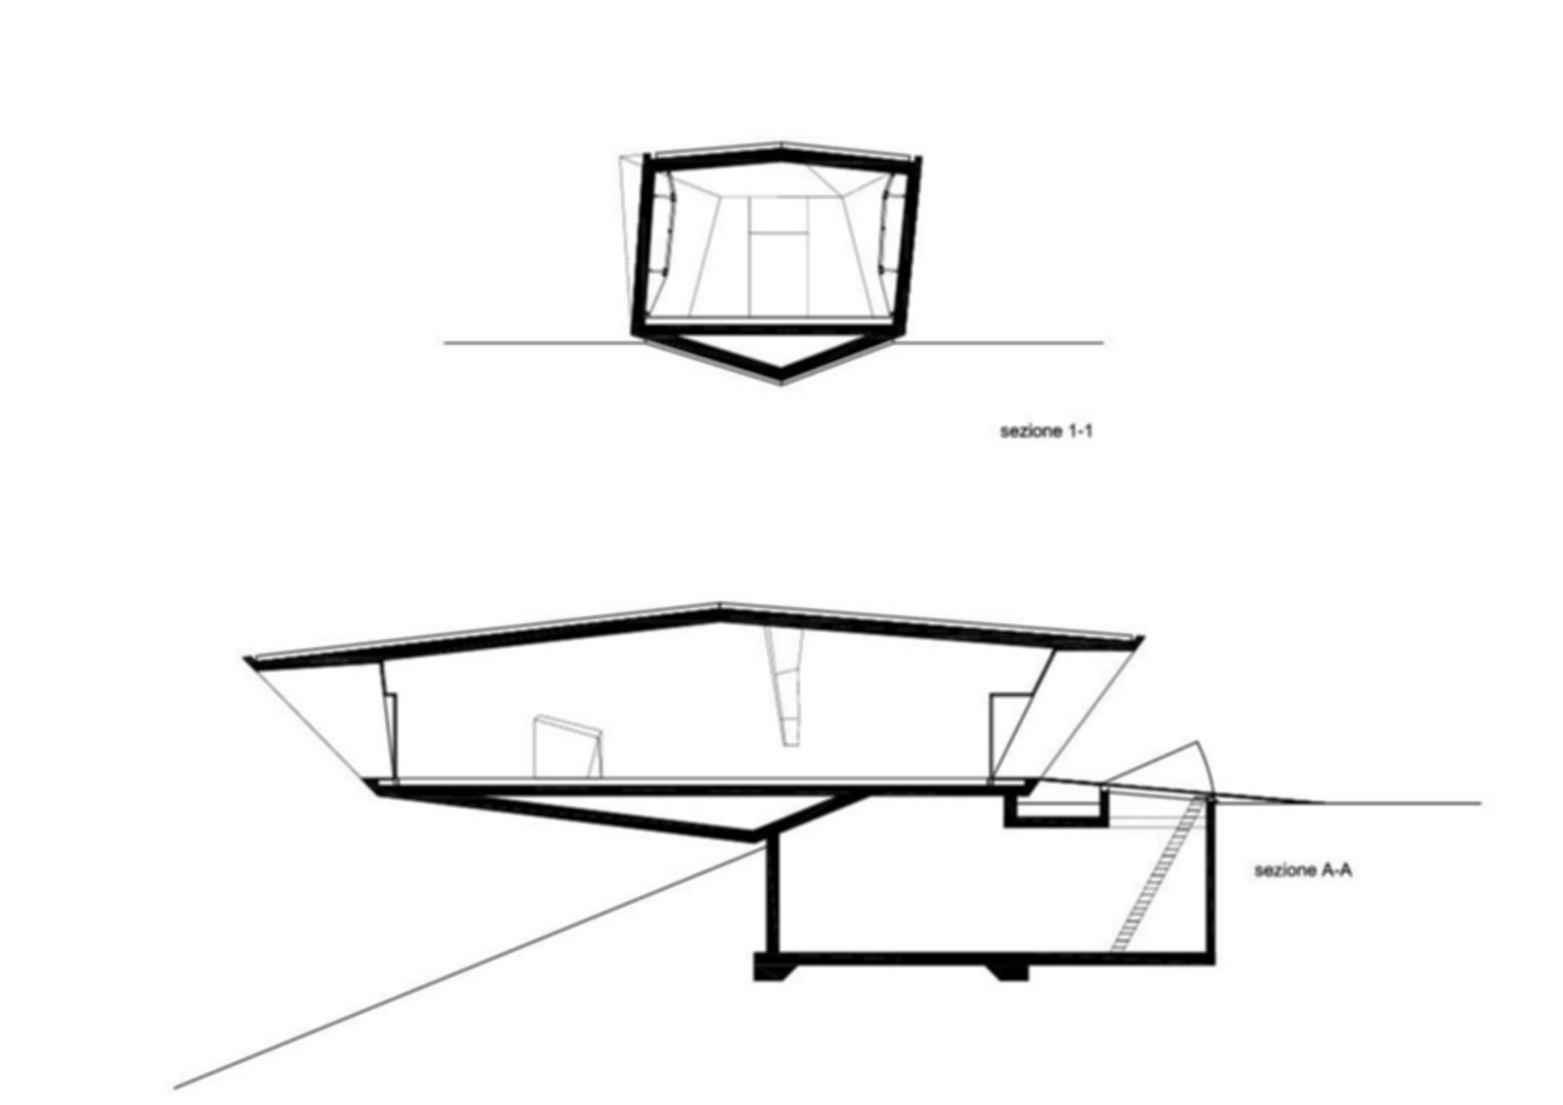 The Timmelsjoch Experience Pass Museum - Site Plan